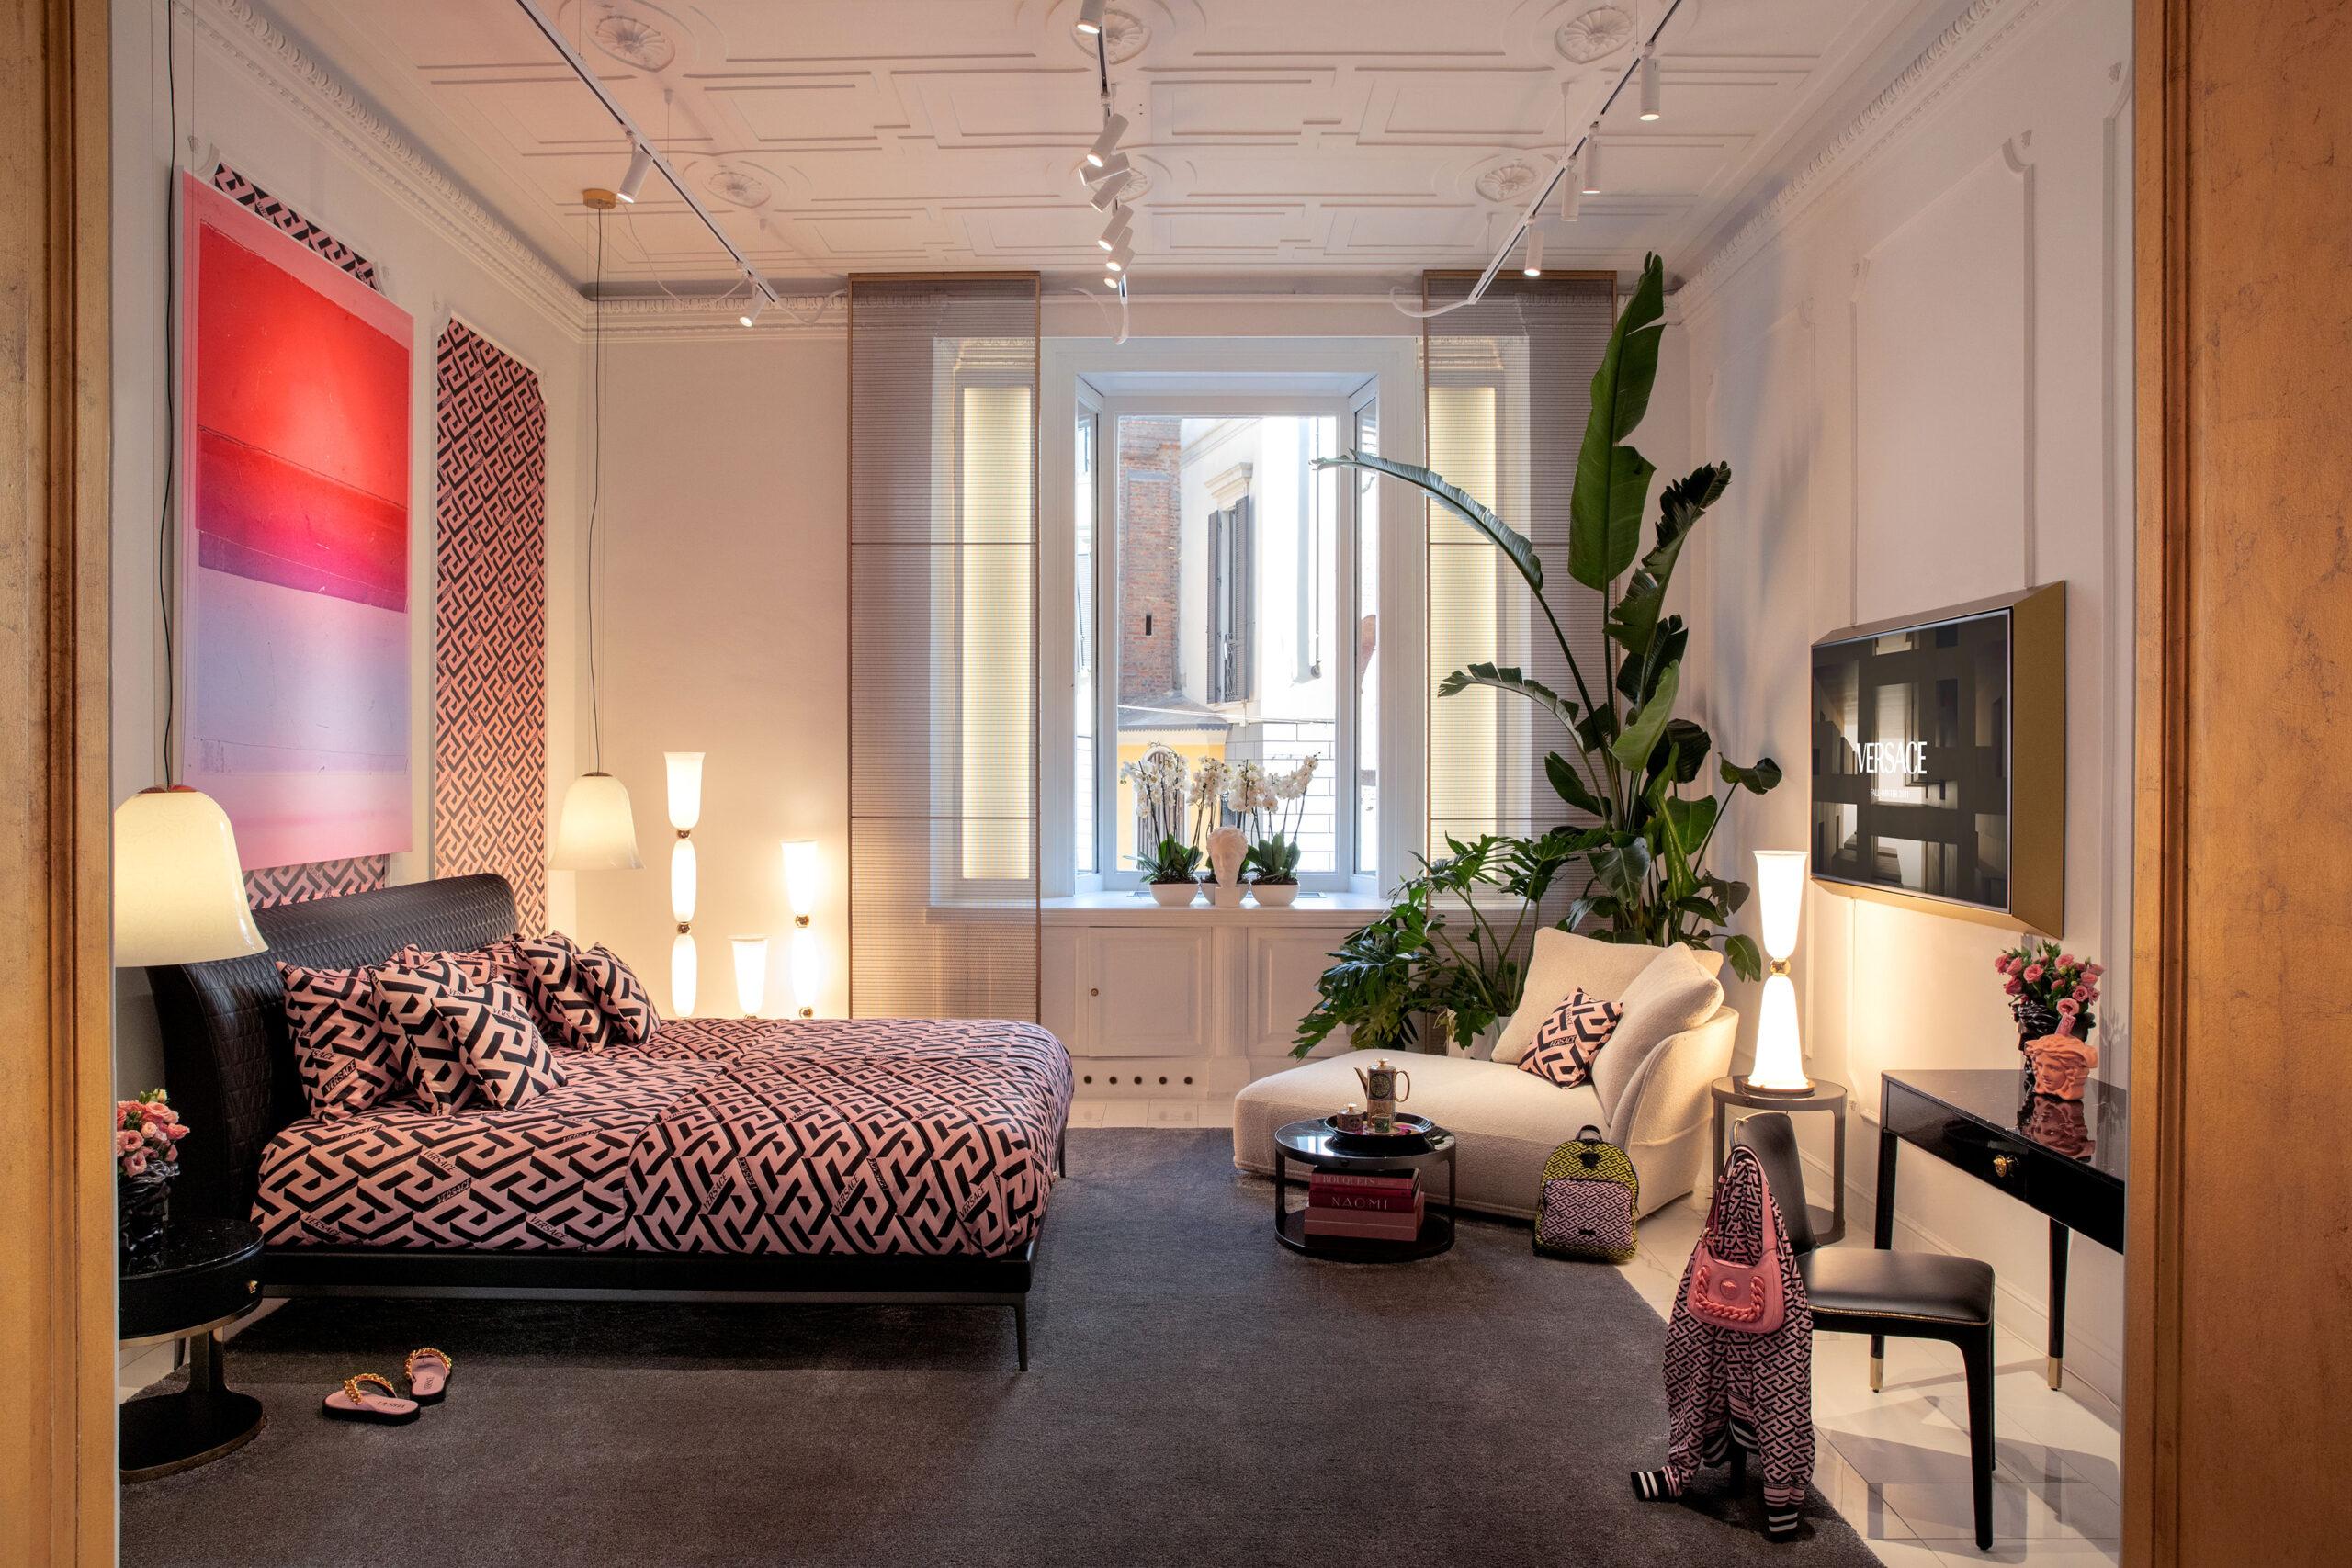 Versace Home, Via Durini boutique, Design Week 2021. Credits Versace